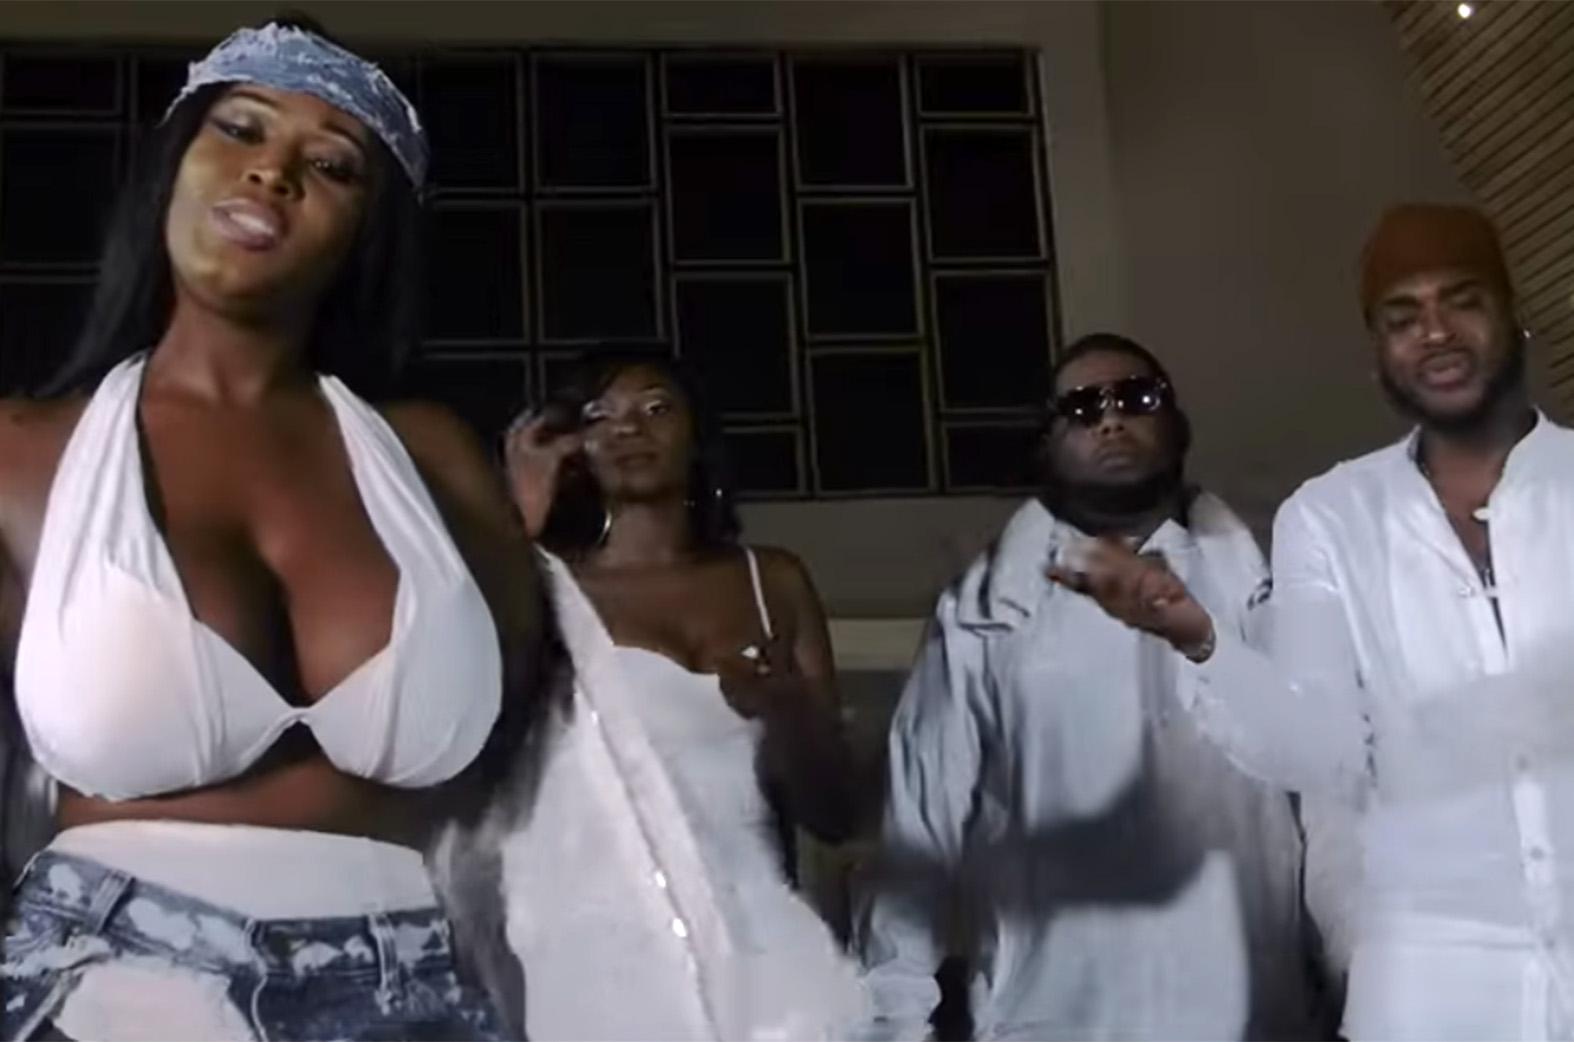 Korkorkor by BAM Allstars feat. D-Black, Dahlin Gage, S3fa, Kobla Jnr, Wisa, Nina Ricchie, Freda Rhymz & Osayo